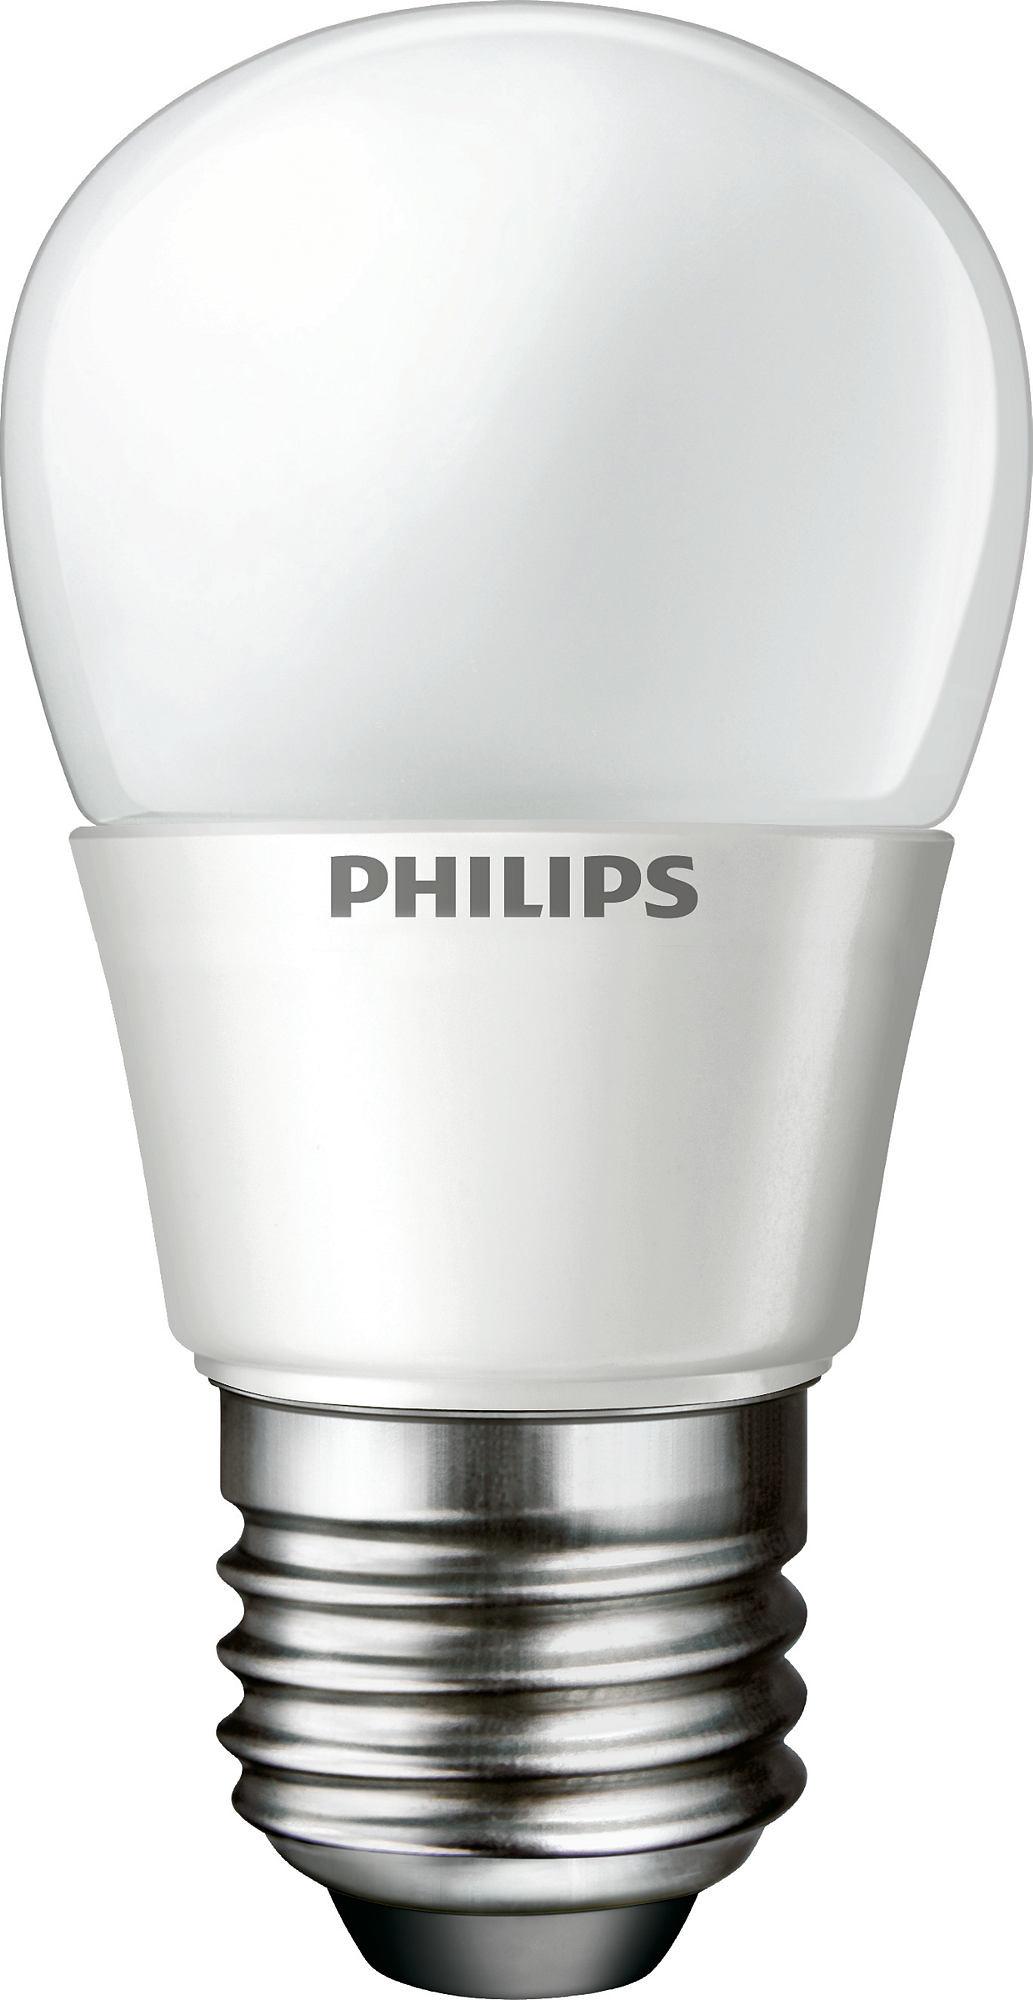 Philips CorePro LEDluster 4-25W E27 827 P45 FR